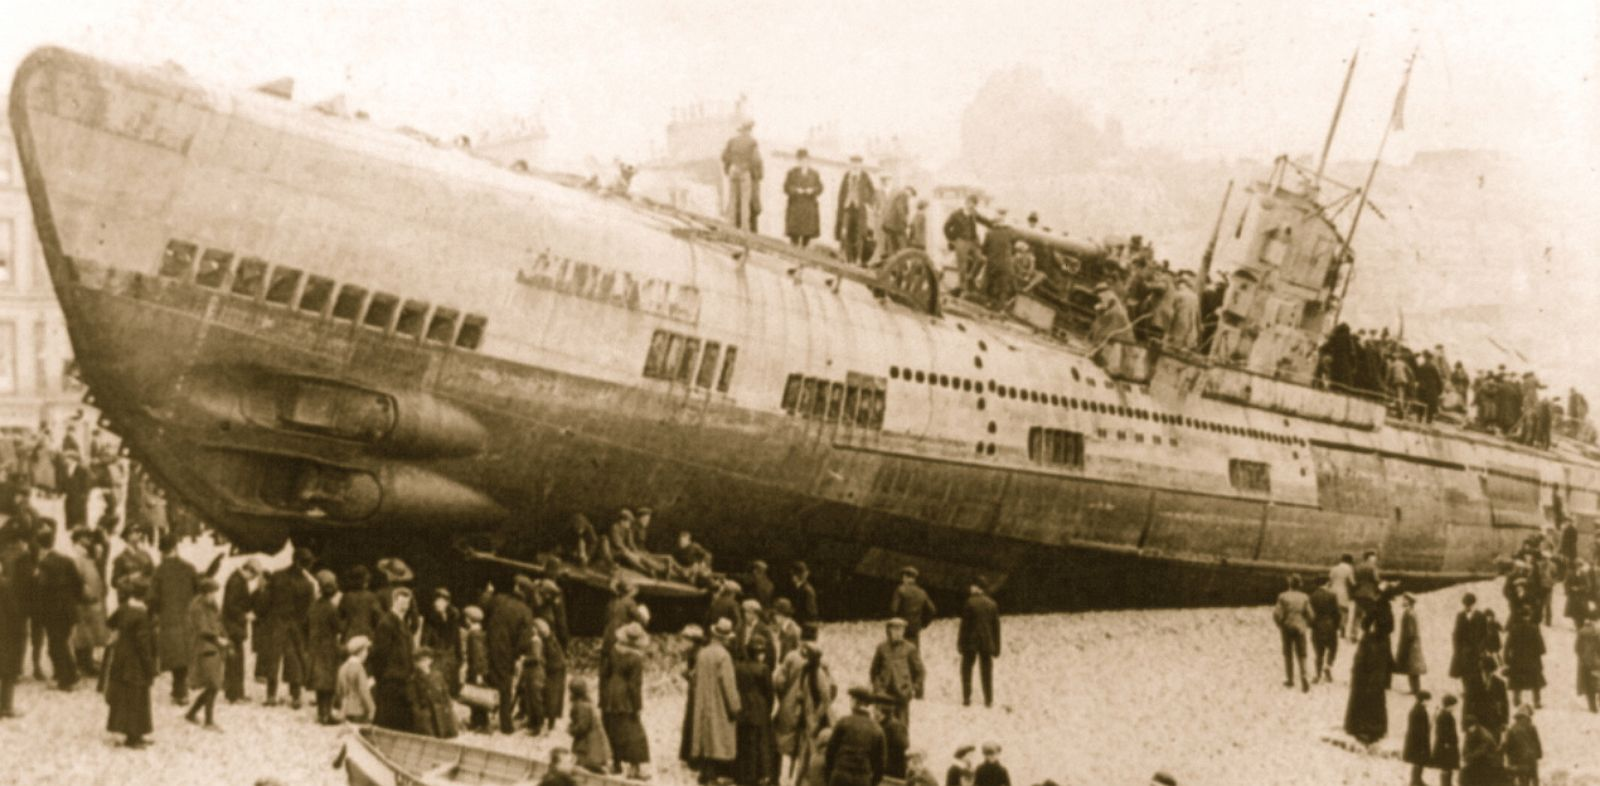 German Subs Sunken Wwi U Boats A Bonanza For Historians